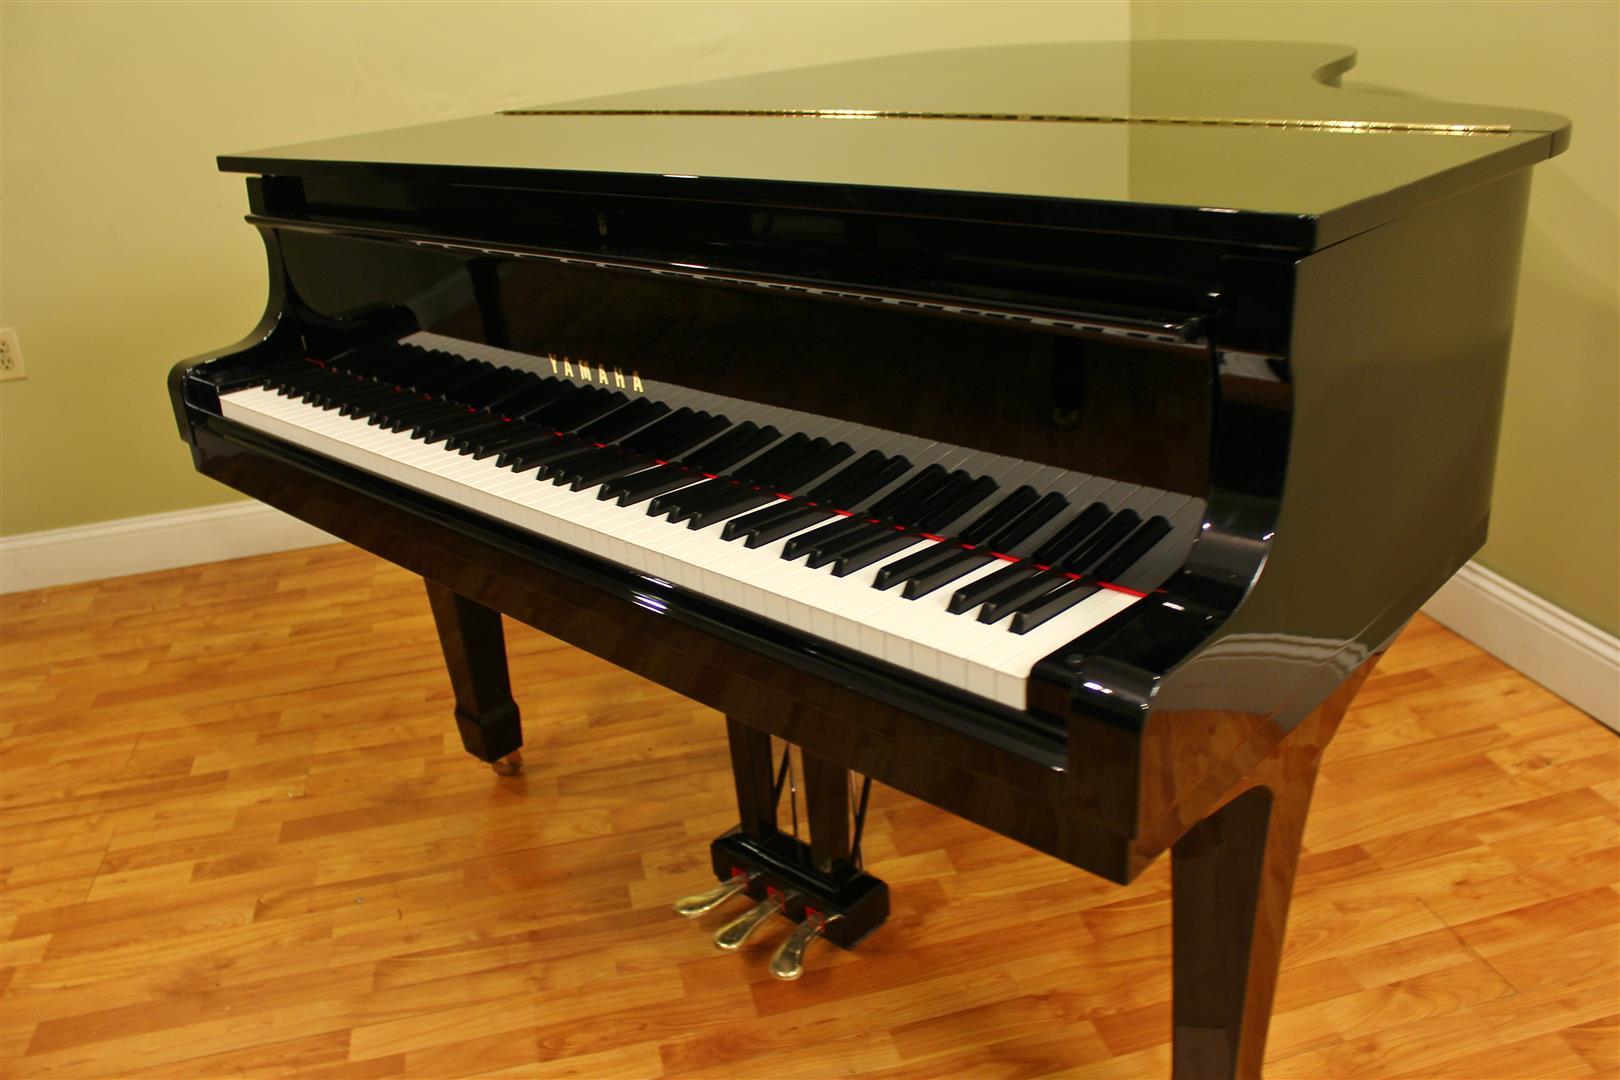 Yamaha baby grand player piano for sale